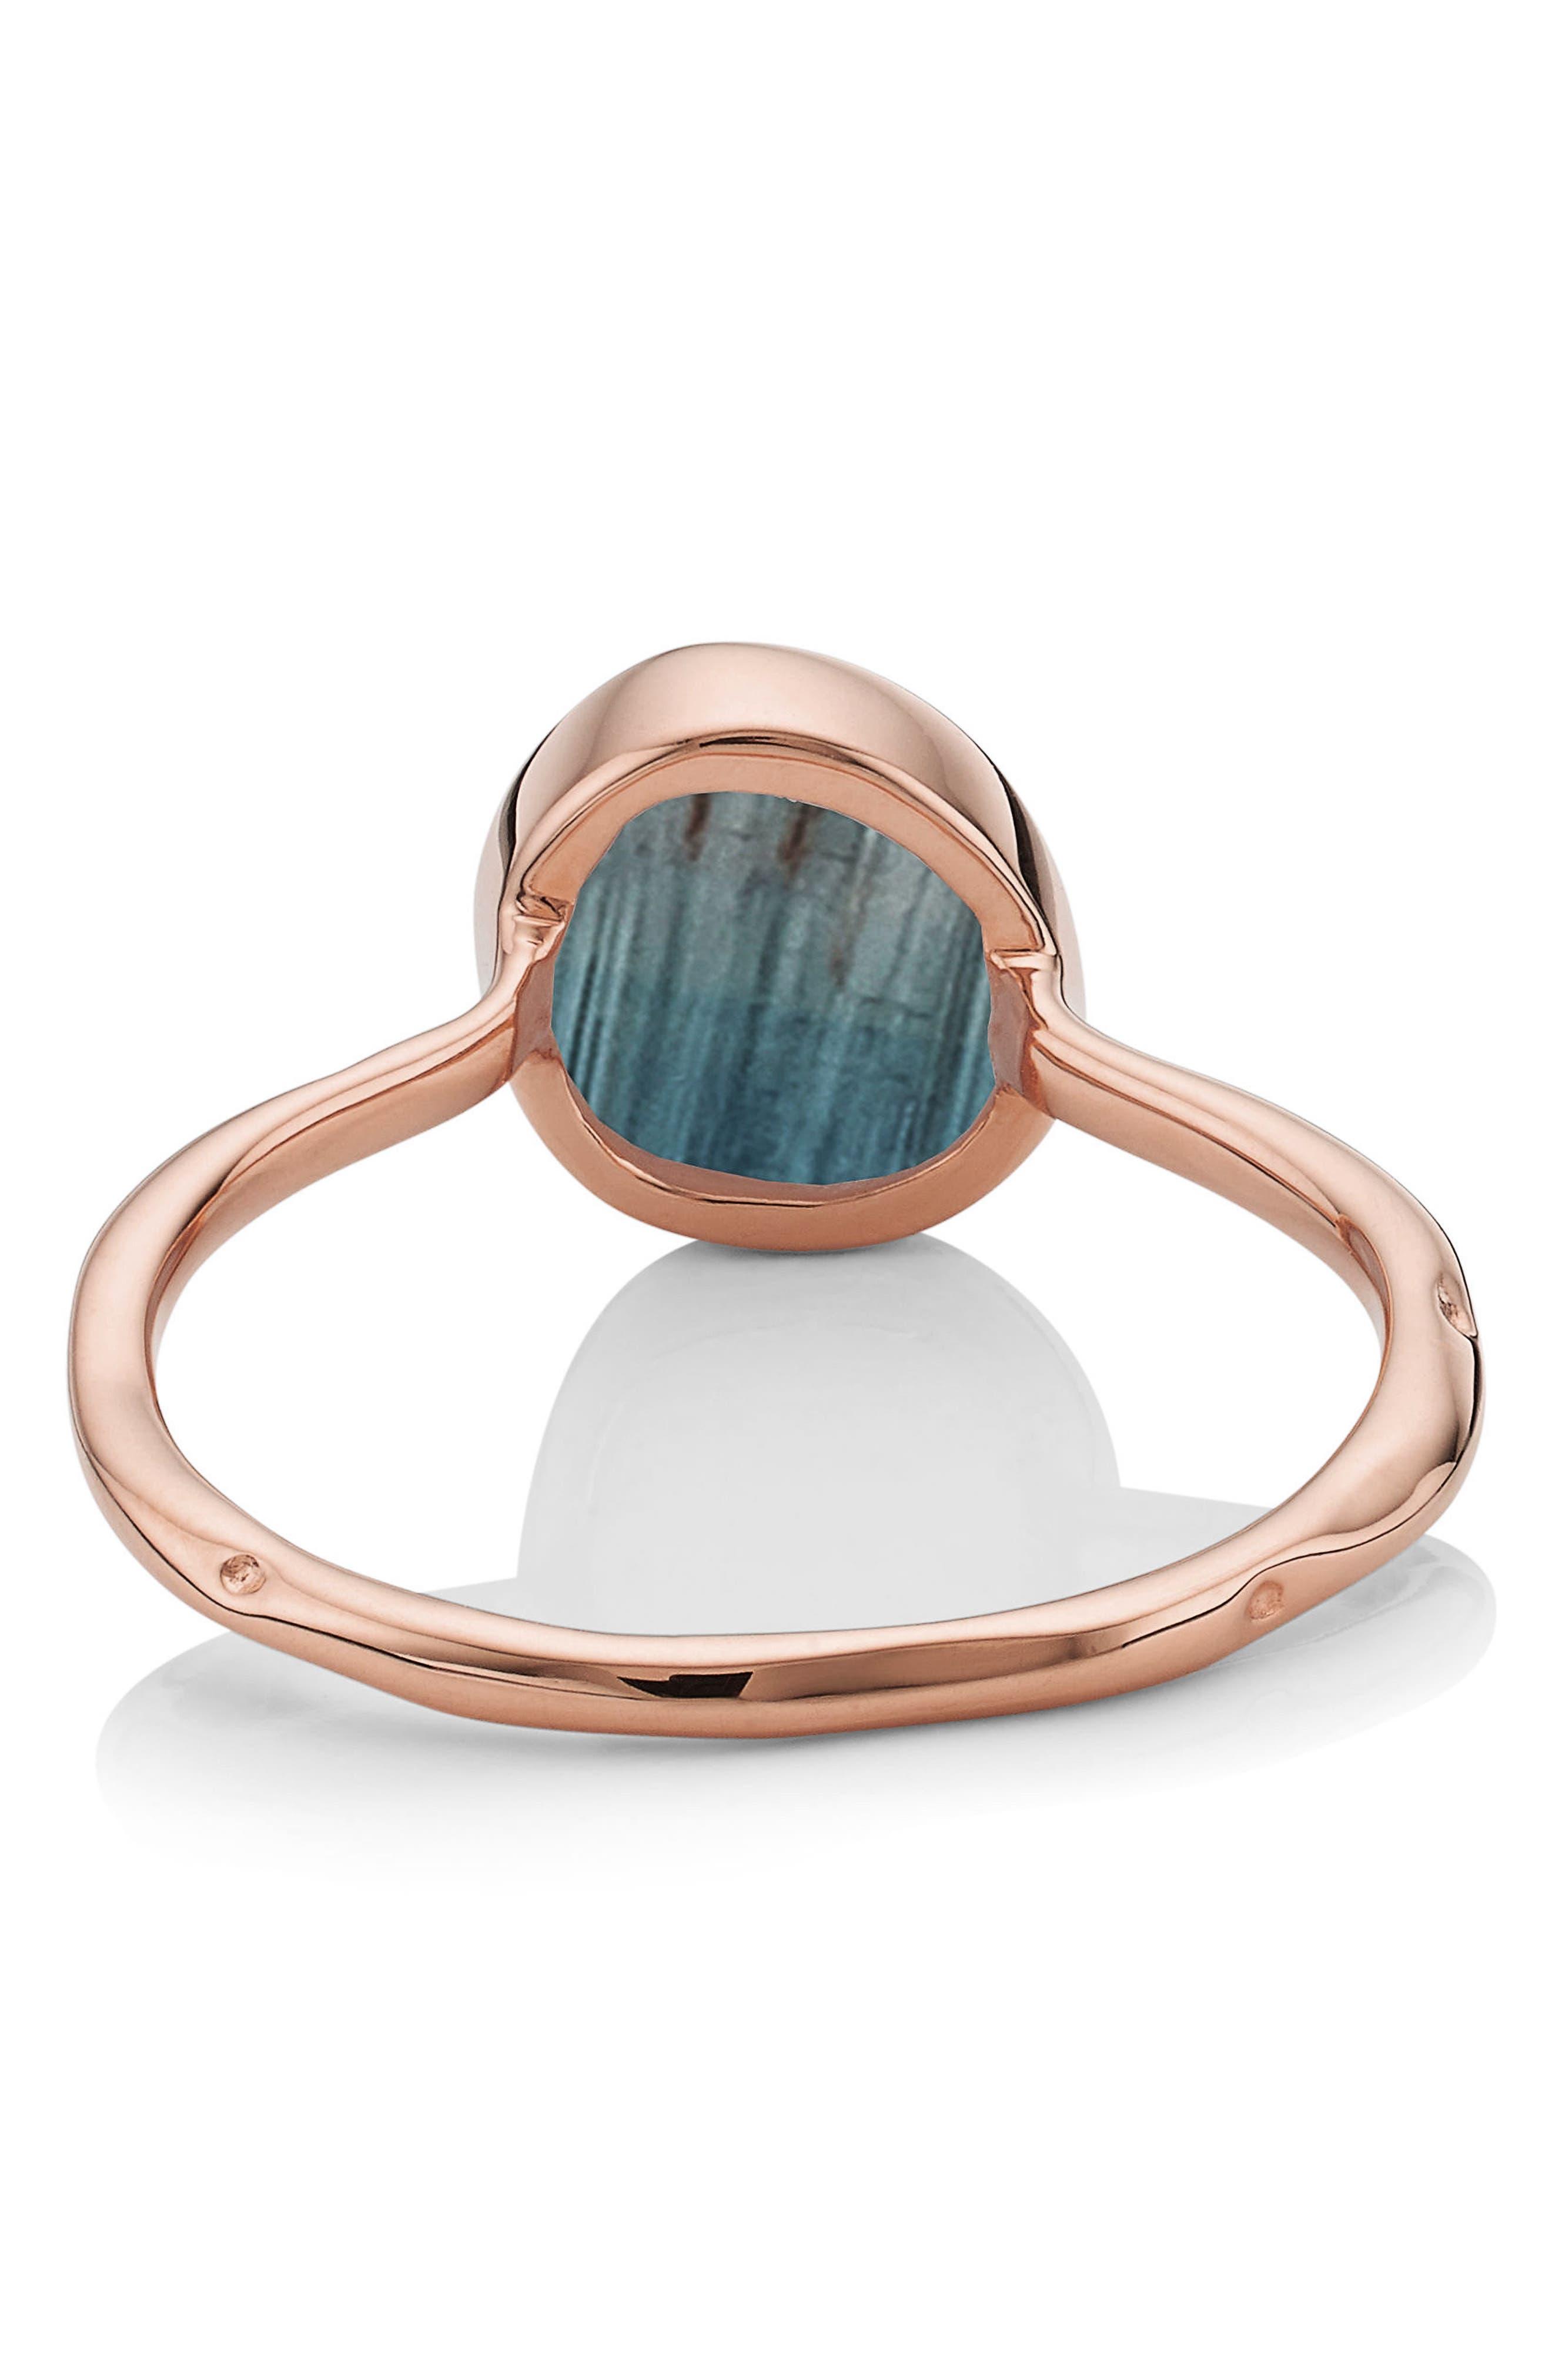 MONICA VINADER, Siren Semiprecious Stone Stacking Ring, Alternate thumbnail 4, color, ROSE GOLD/ KYANITE